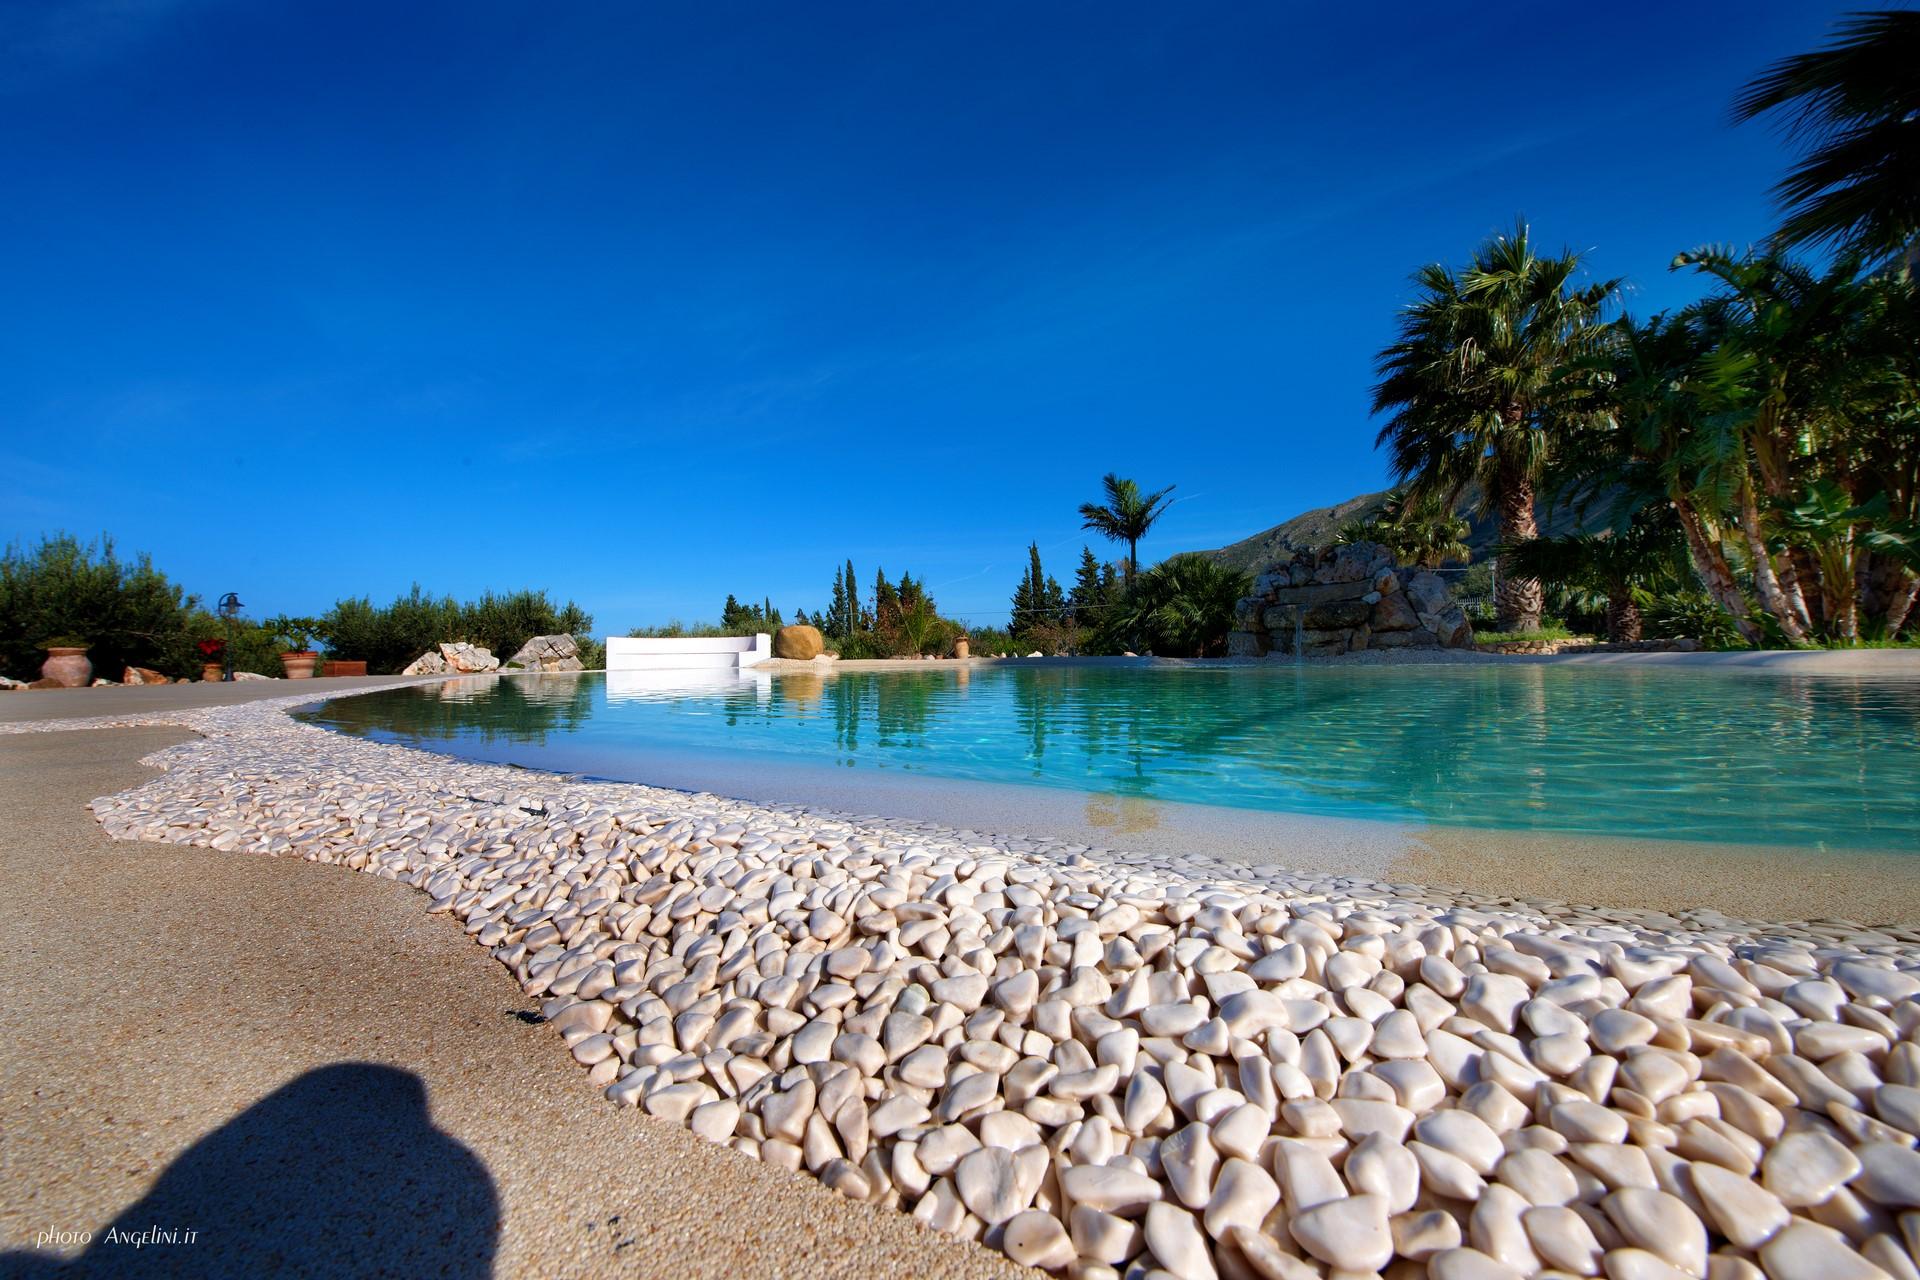 piscina-naturale-biodesign-030